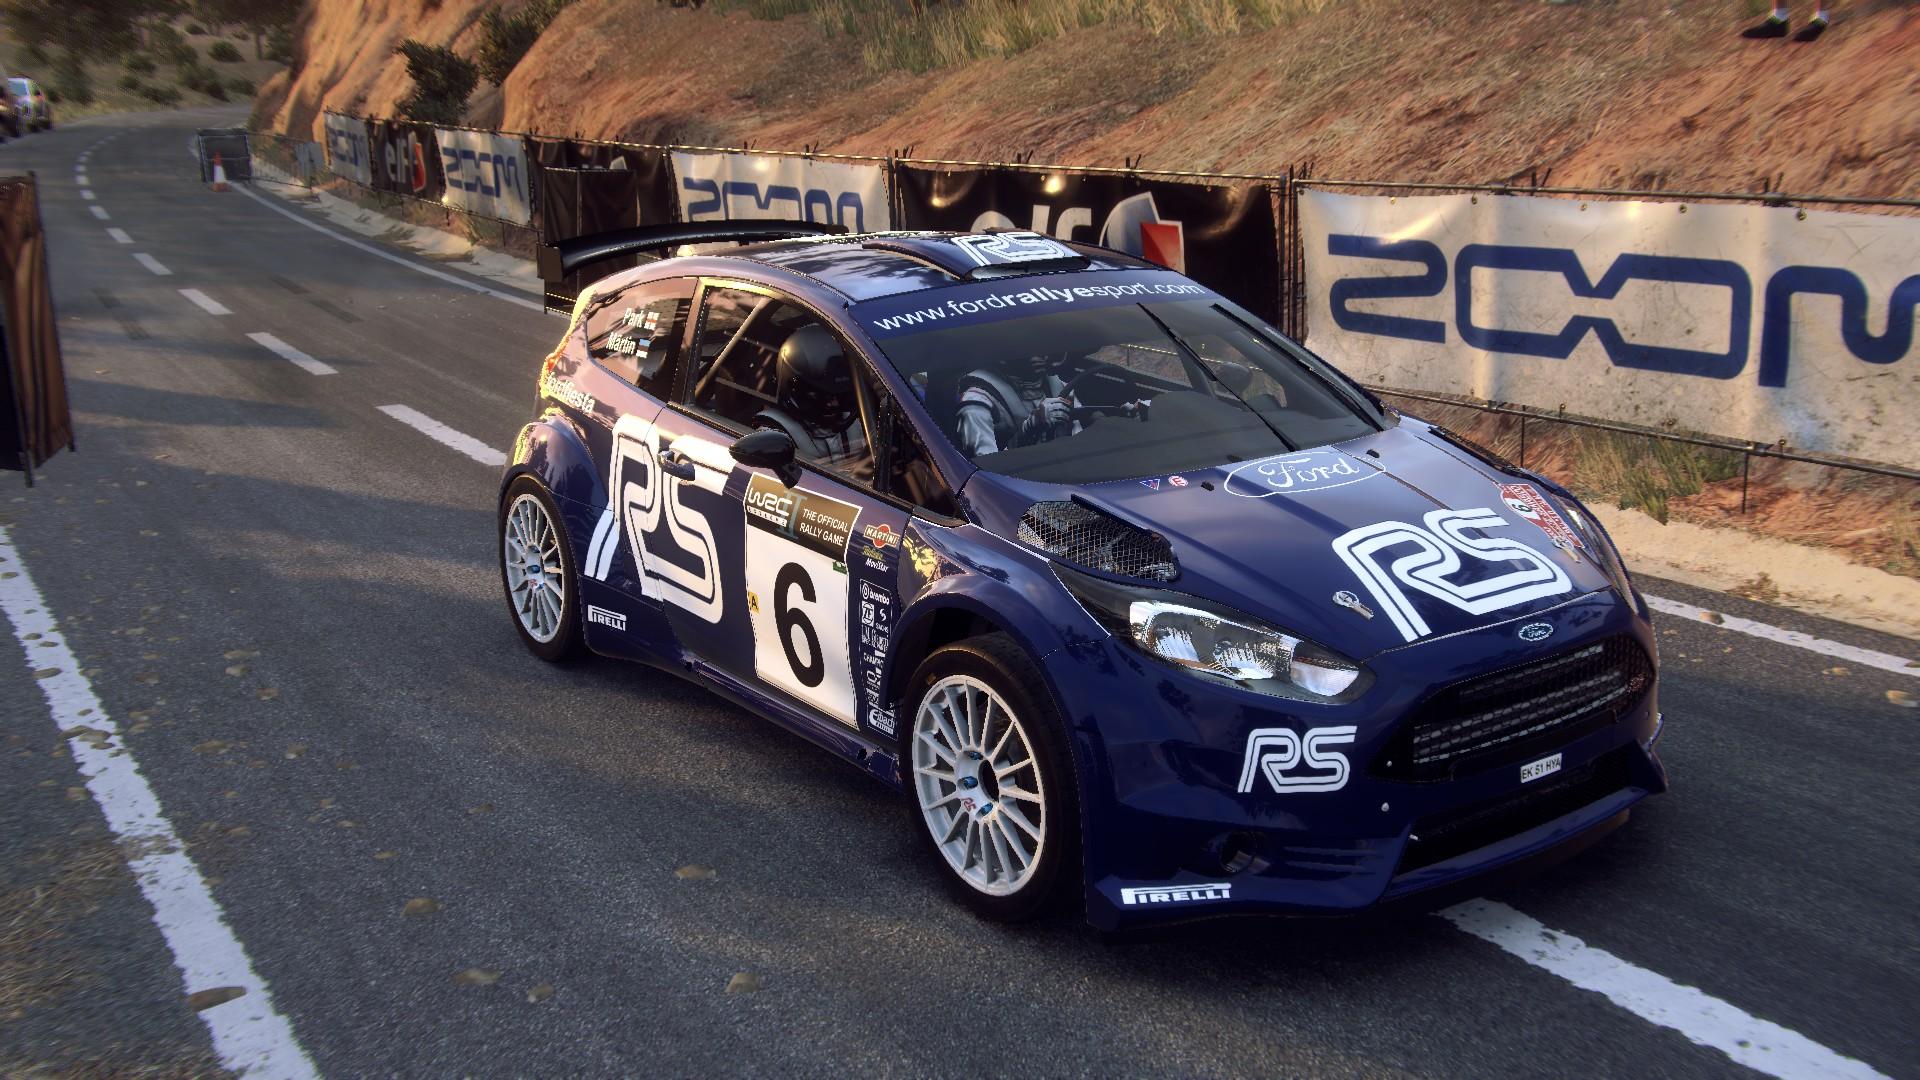 Ford Fiesta R5 (Märtin-Parks - Rallye Sanremo - Rallye d'Italia 2002 - Hommagge) (1).jpg